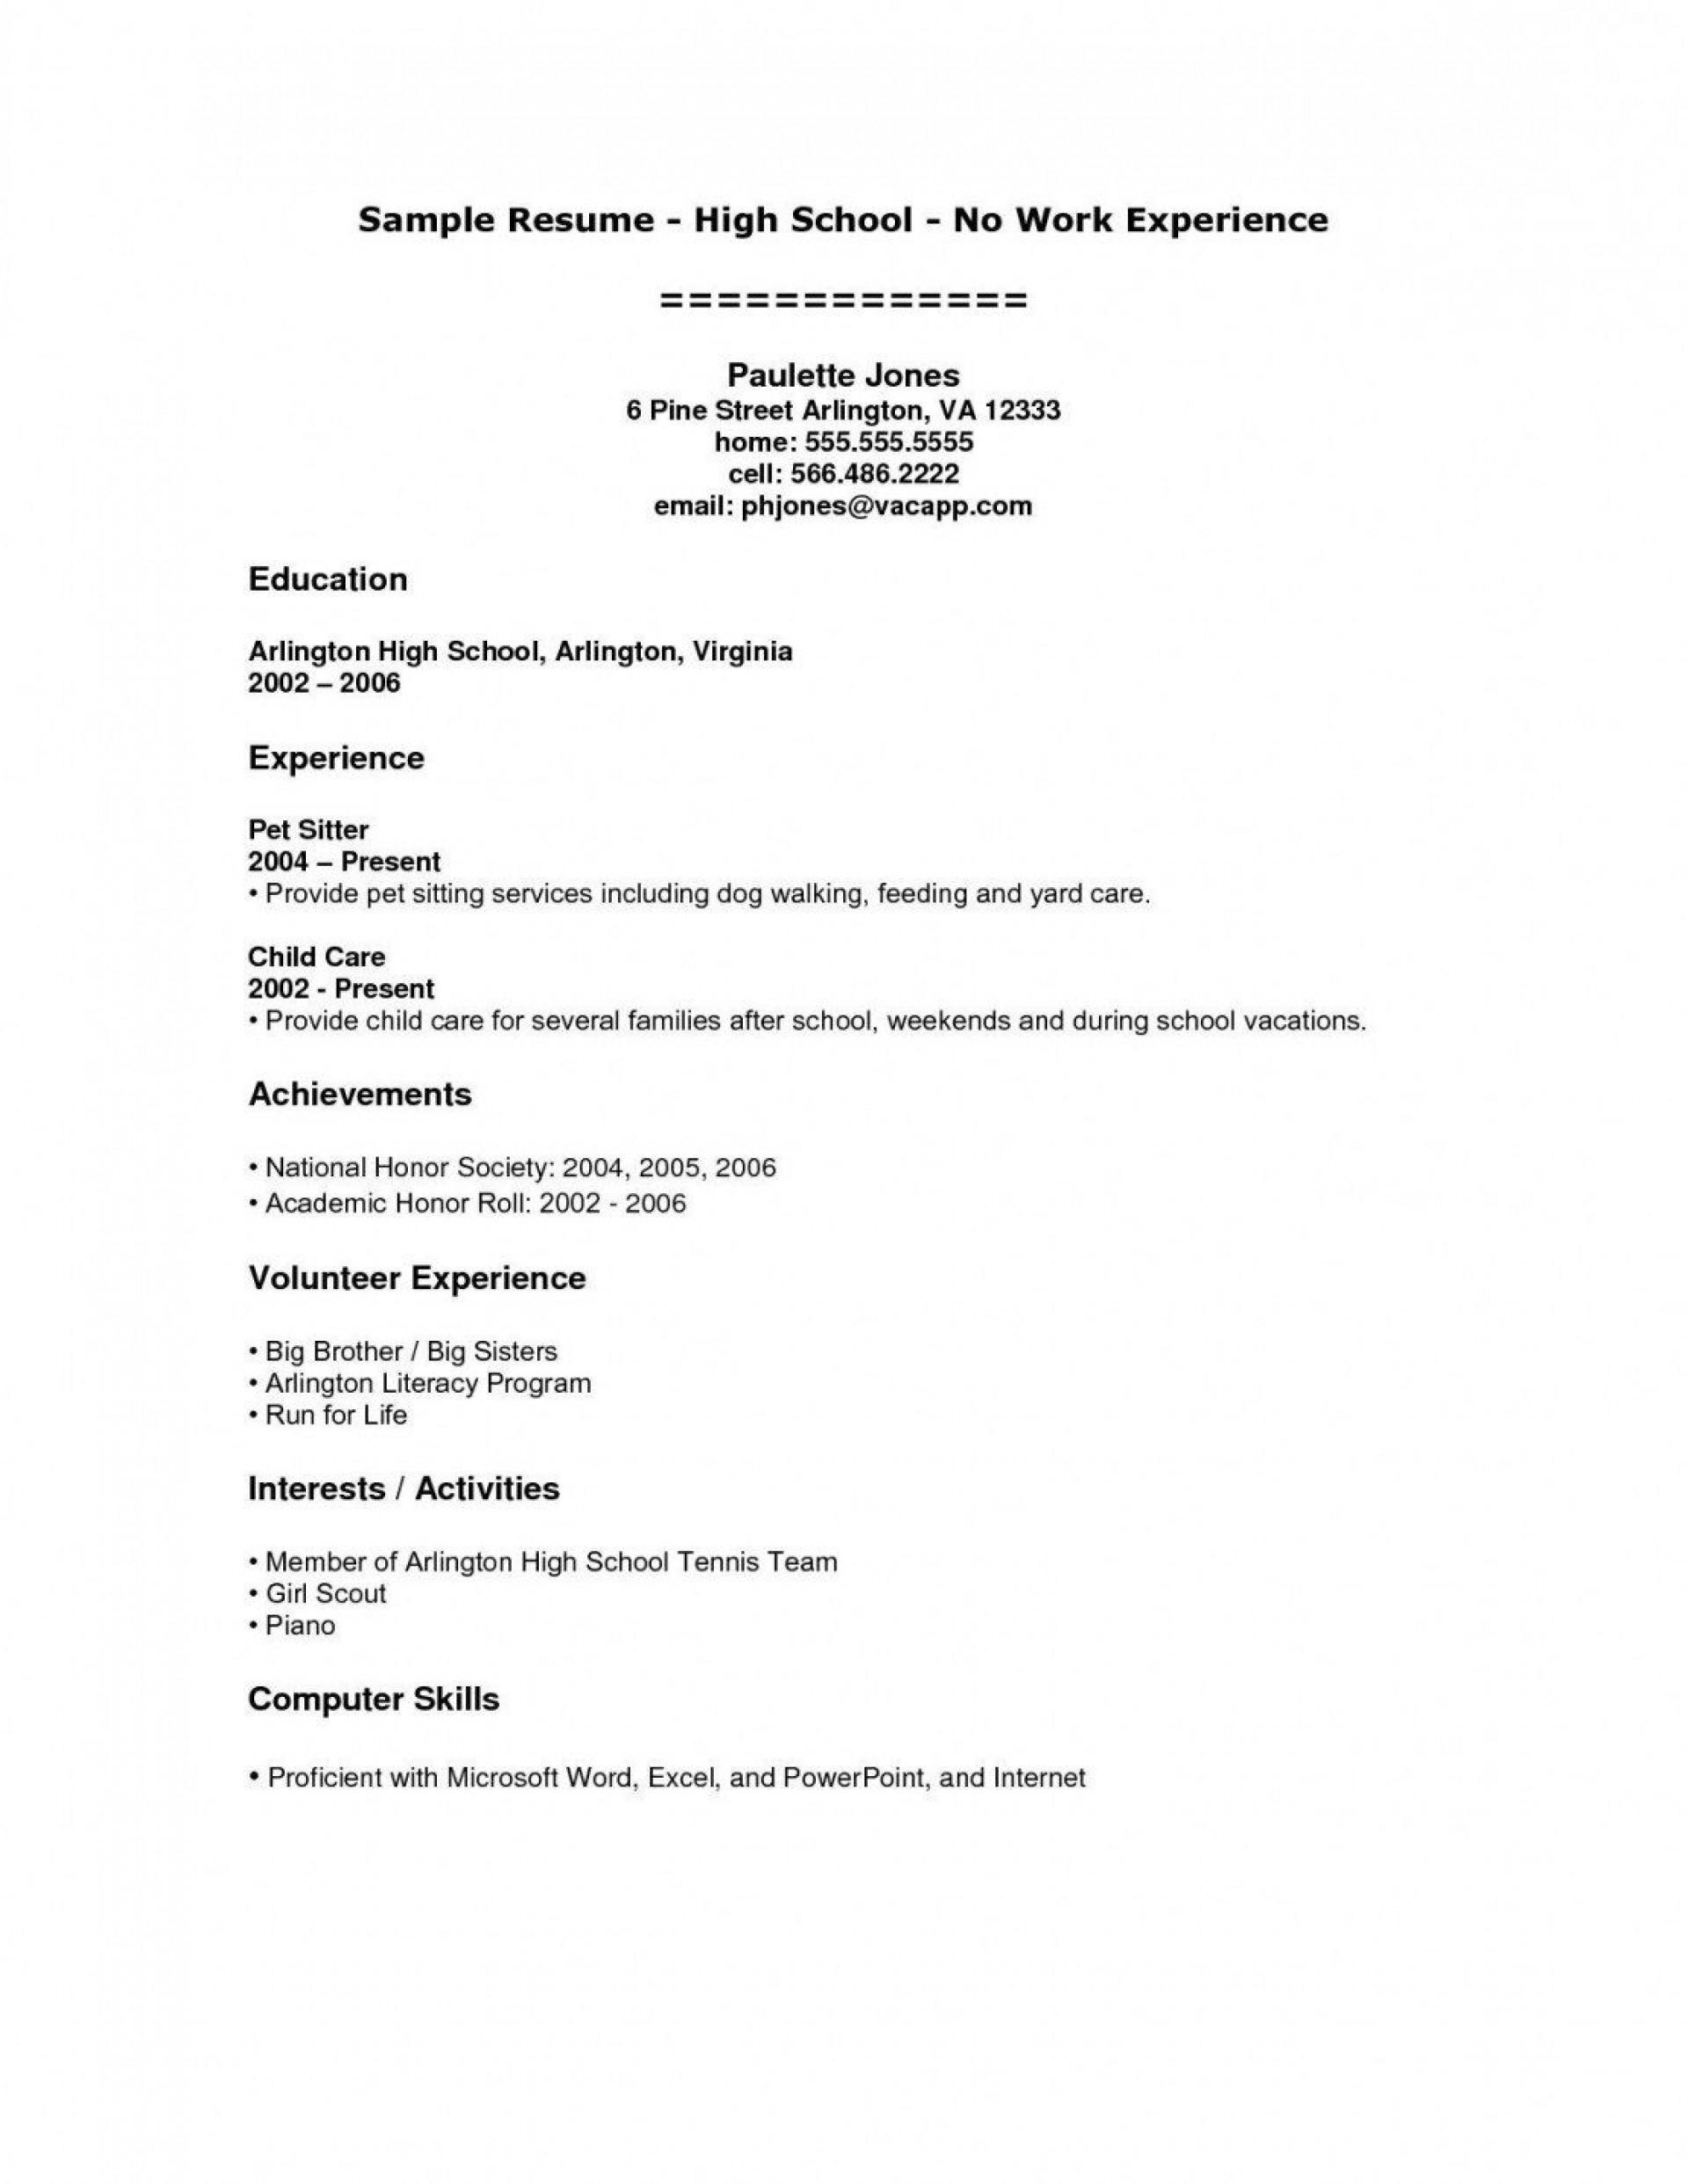 008 Shocking High School Student Resume Template Inspiration  Free Microsoft Word 20101920